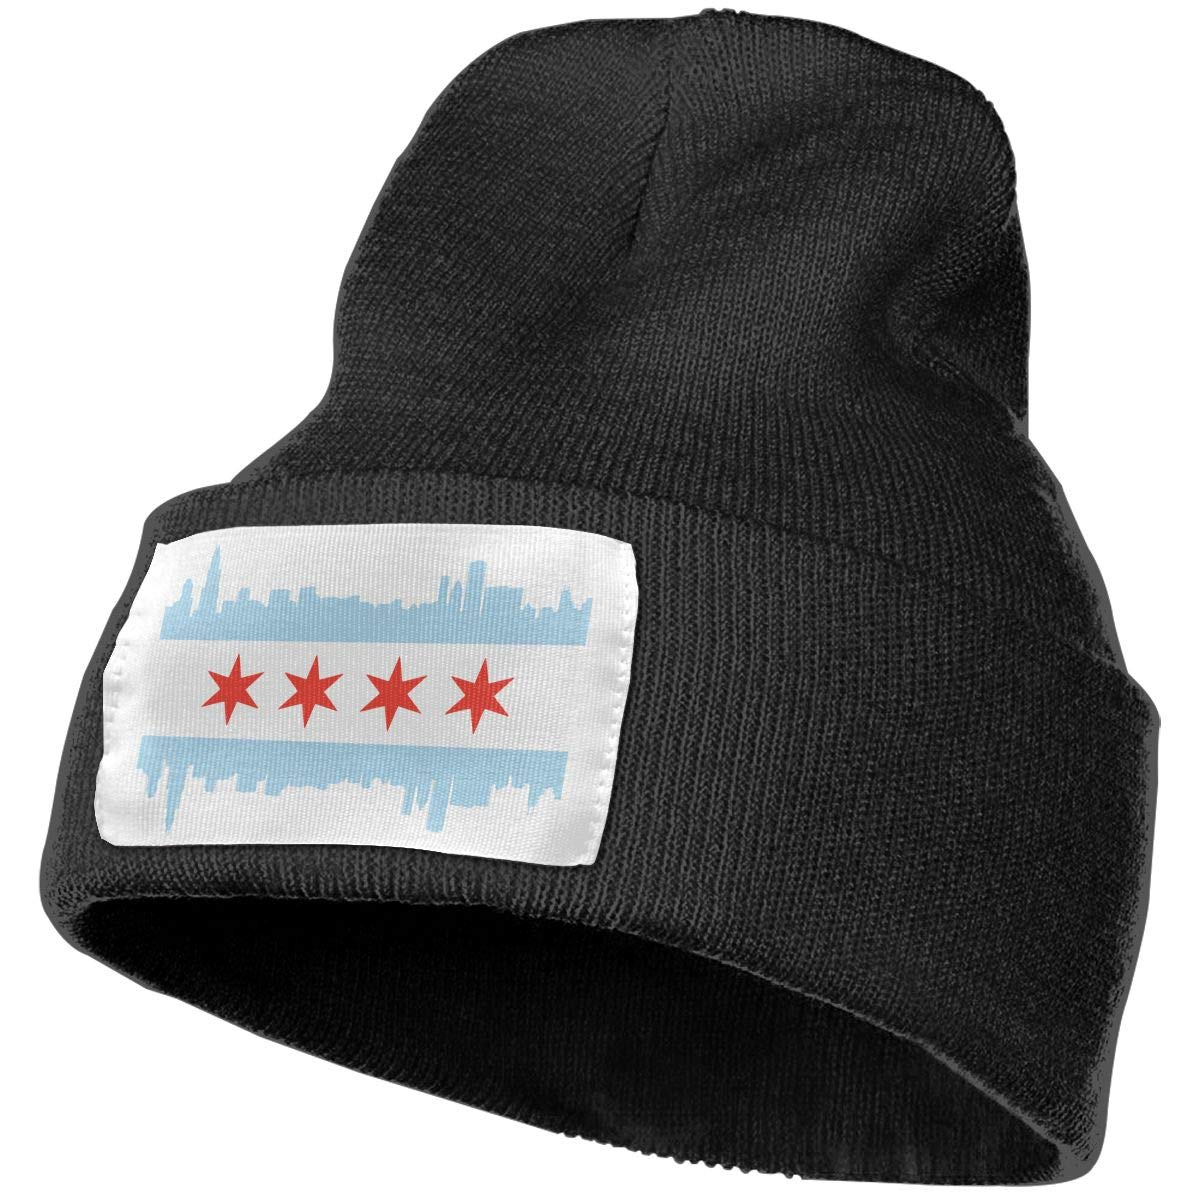 3a40b8c55cf TAOMAP89 Chicago Flag Skyline Men   Women Skull Caps Winter Warm Stretchy  Knitting Beanie Hats at Amazon Men s Clothing store